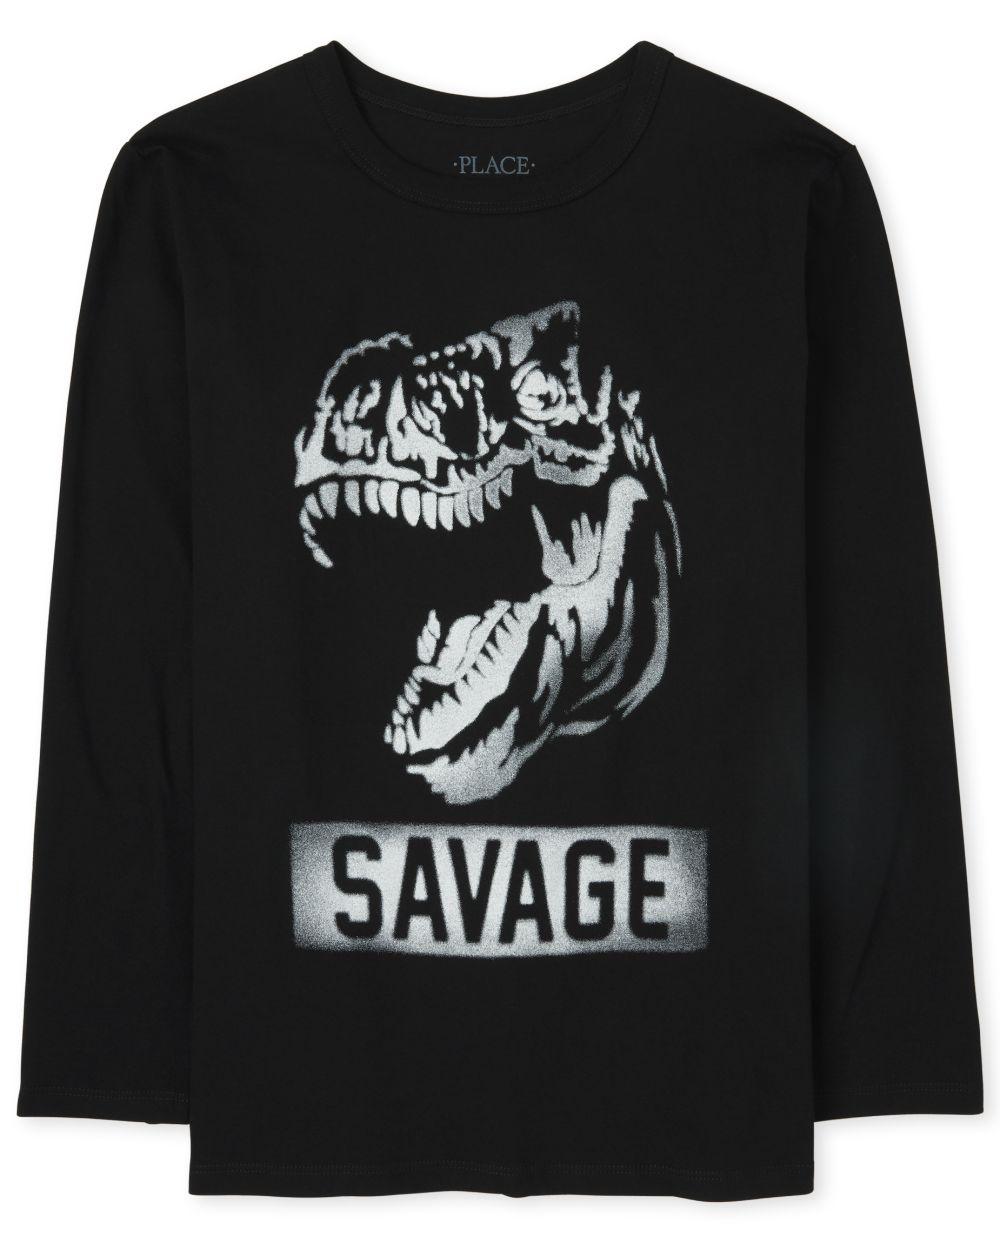 Boys Dino Savage Graphic Tee - Black T-Shirt